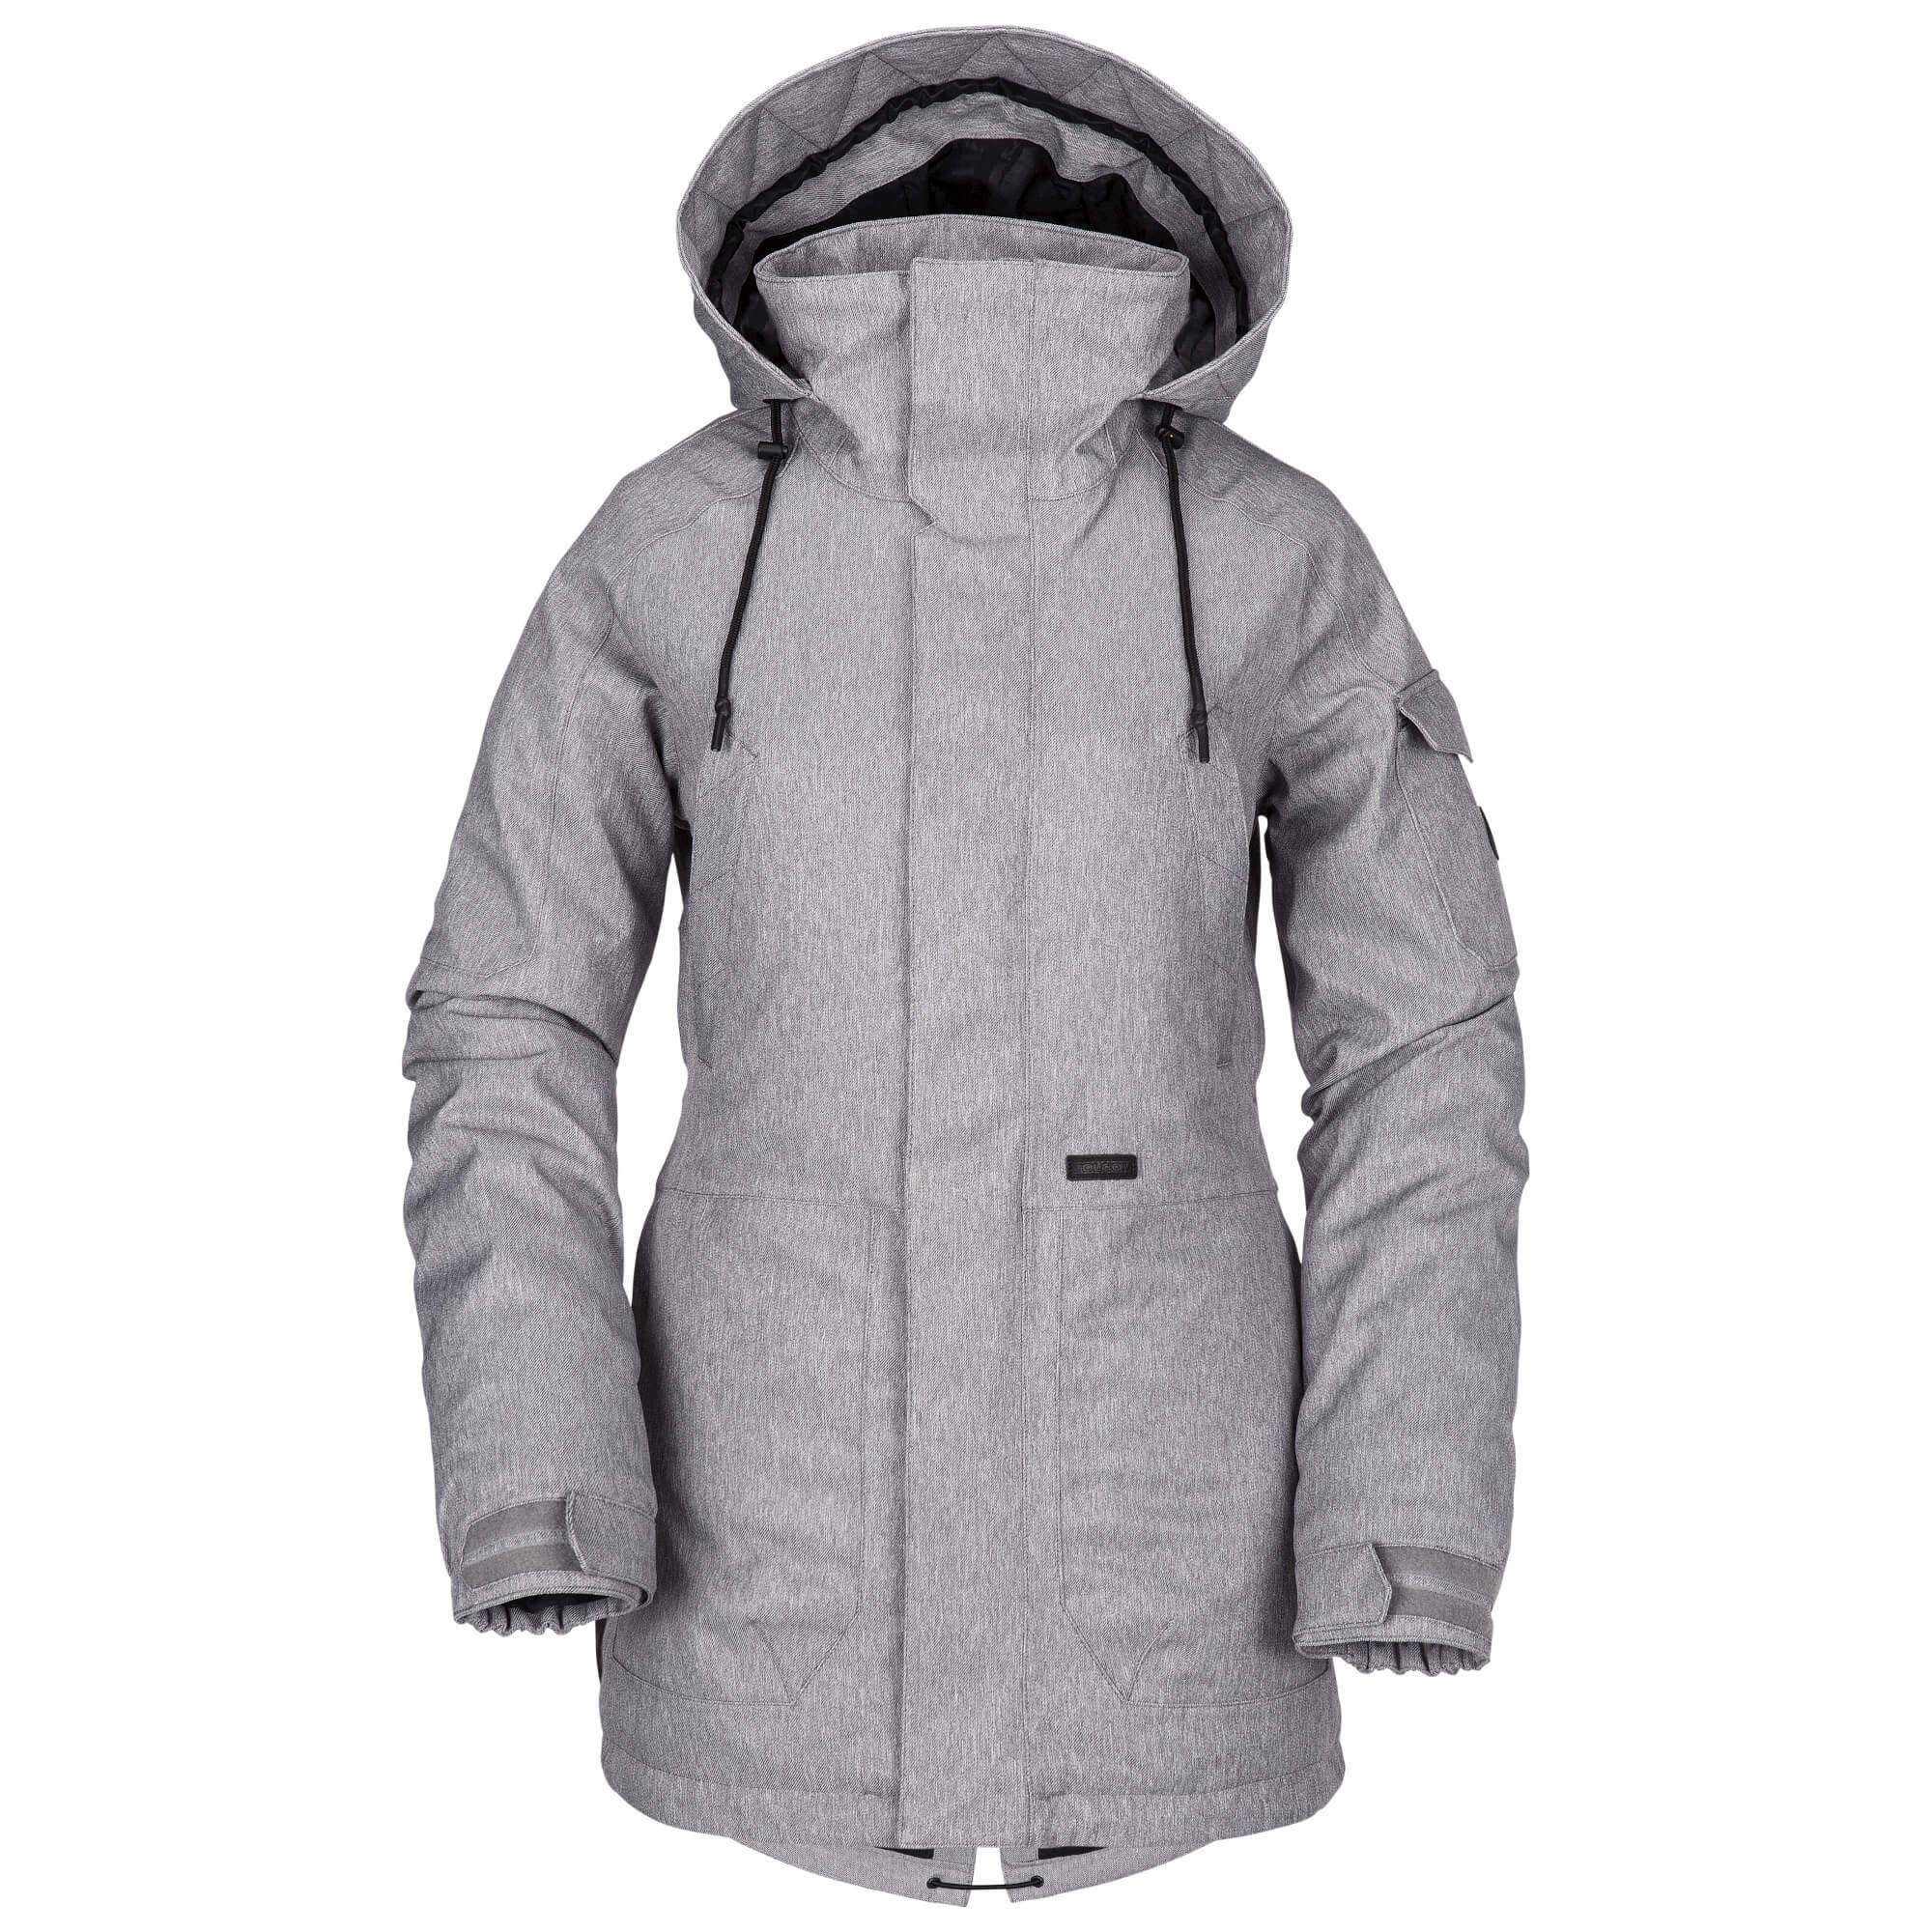 fd0900cd9e1daa Volcom Women's Shrine Insulated Snow Jacket, Heather Grey, Extra Small